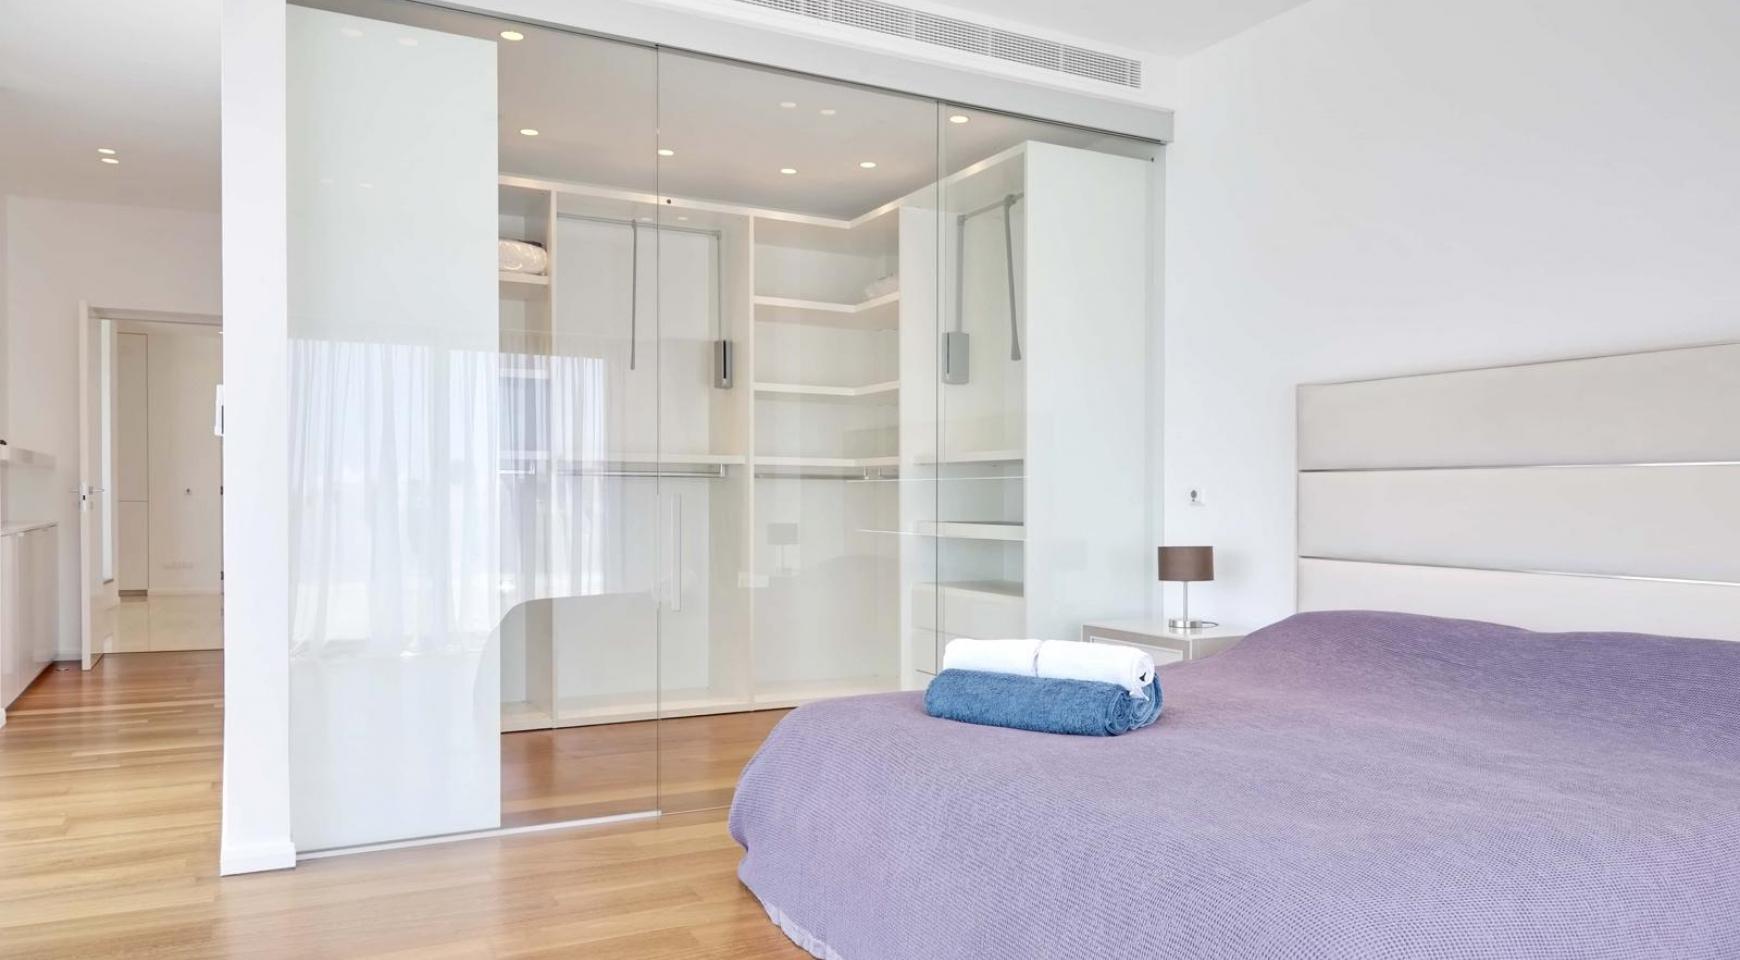 New Luxurious 4 Bedroom Villa in the Tourist Area - 29